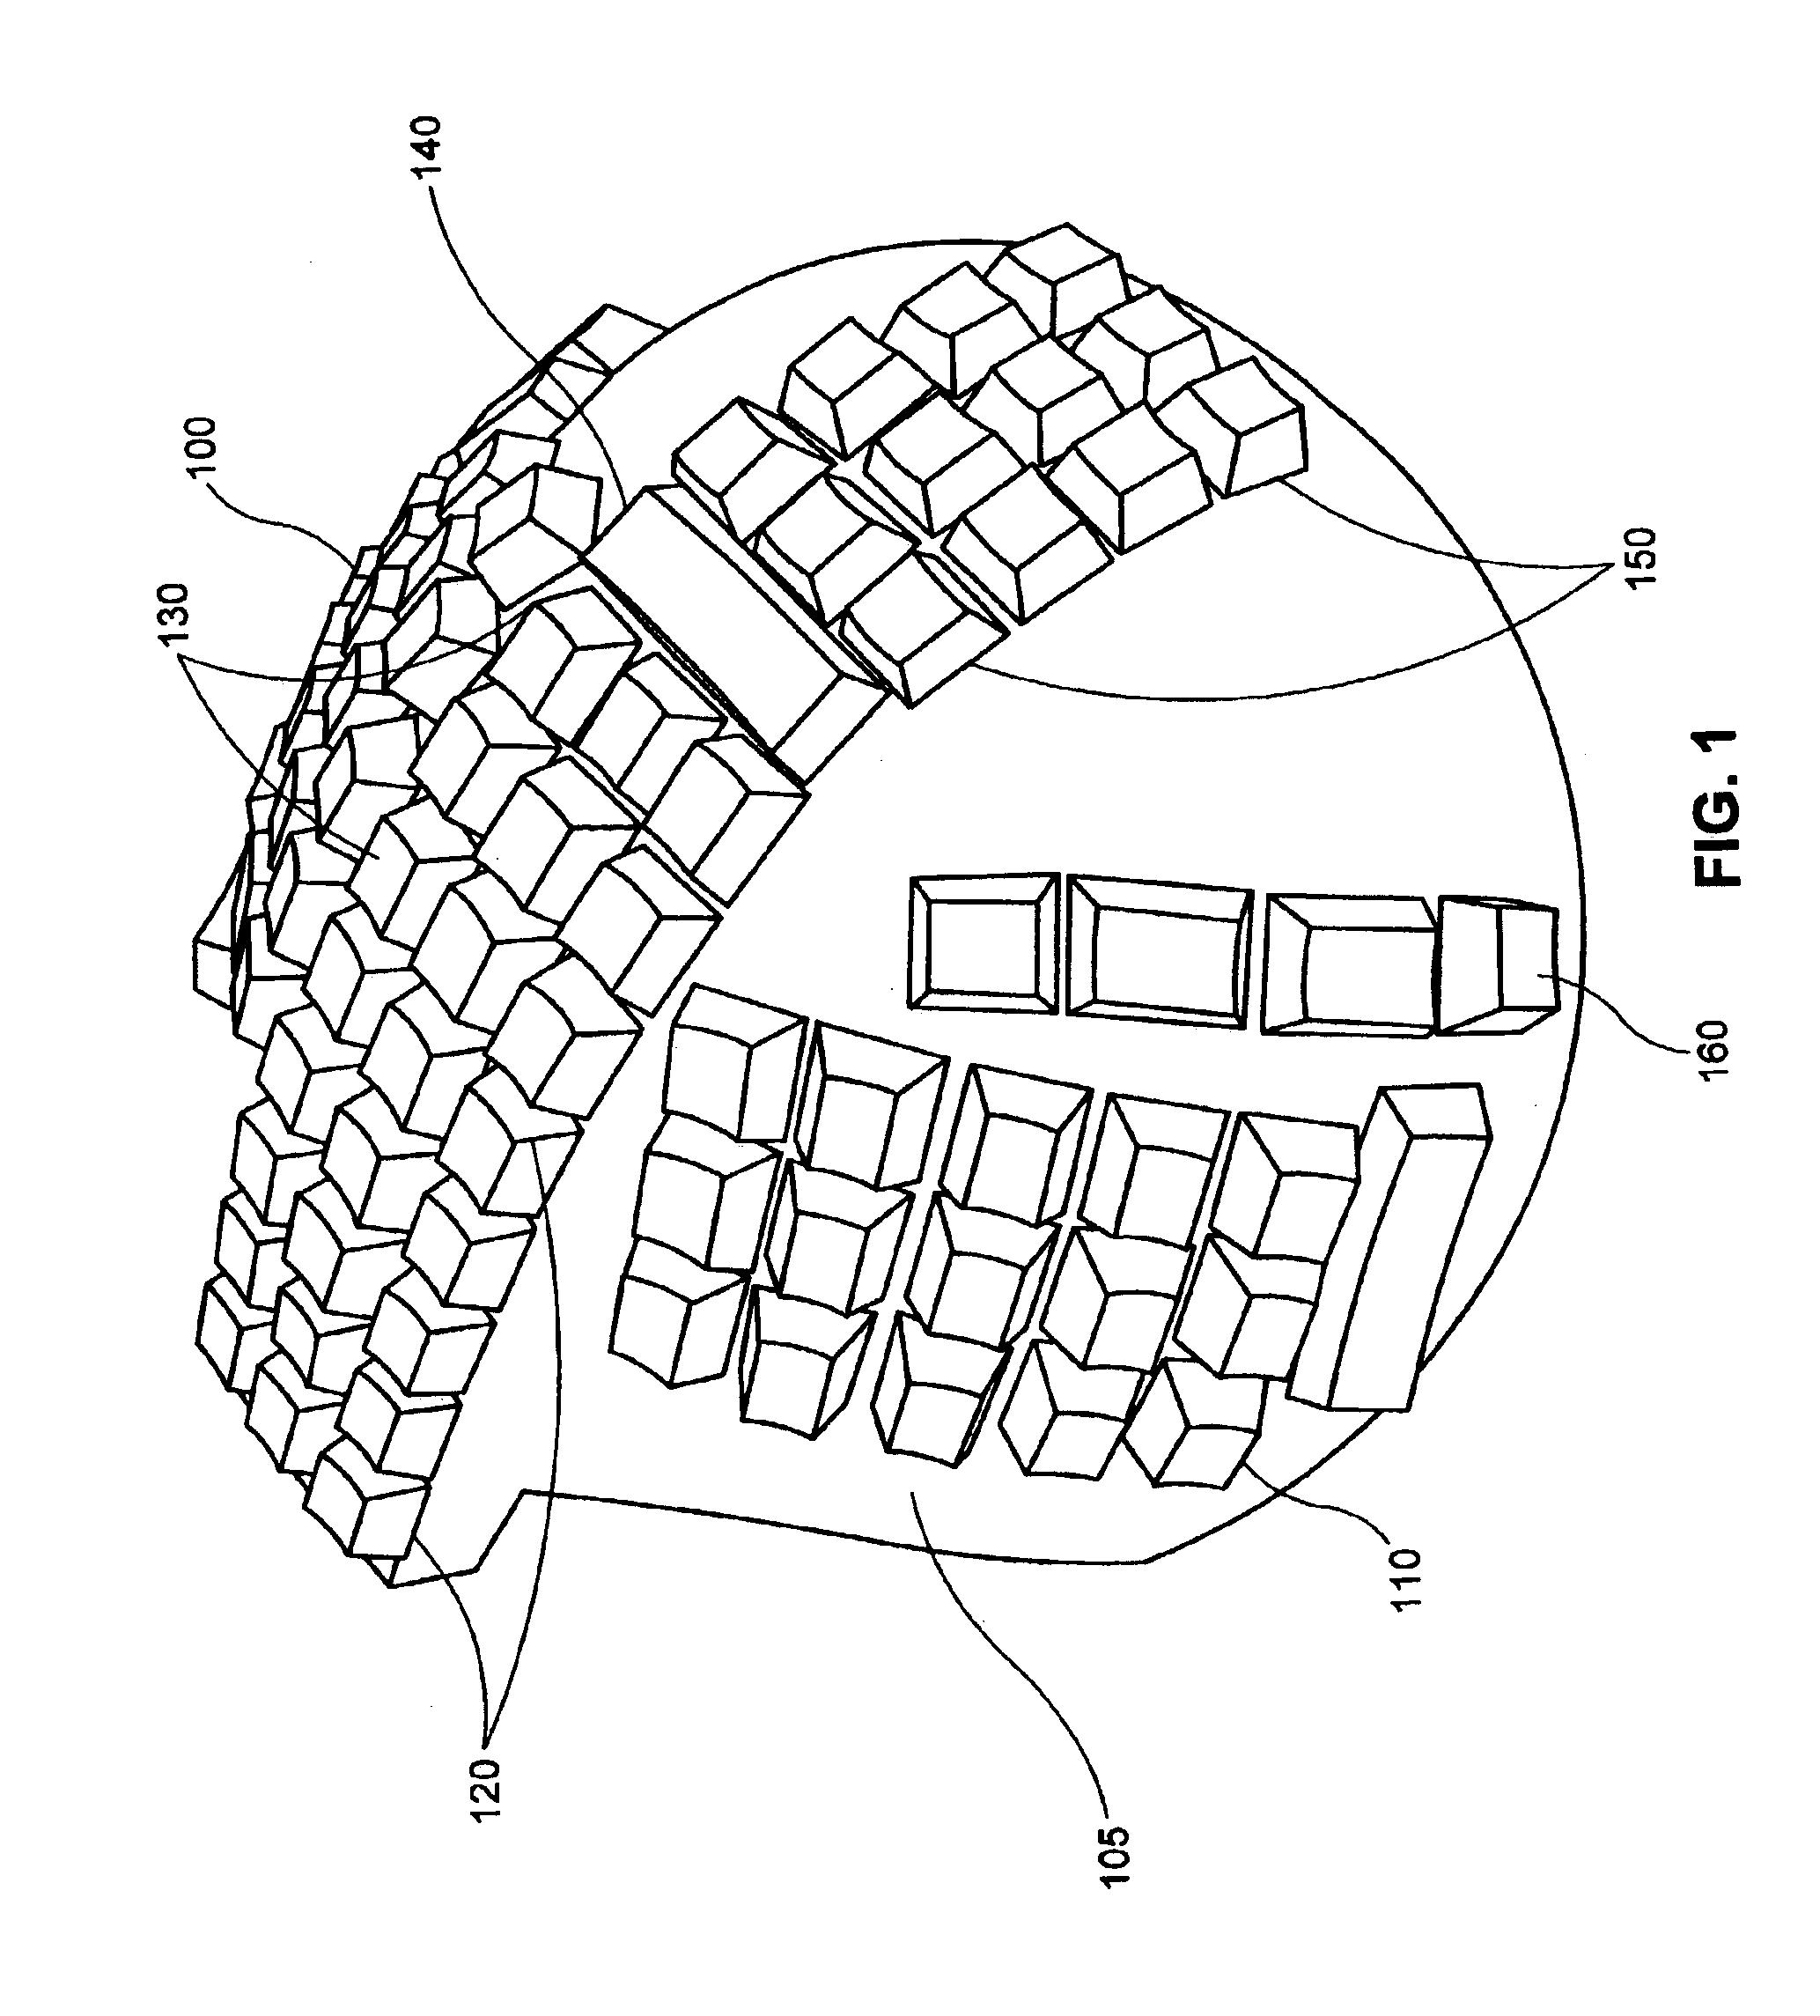 patent us6802662 - non-linear ergonomic keyboard